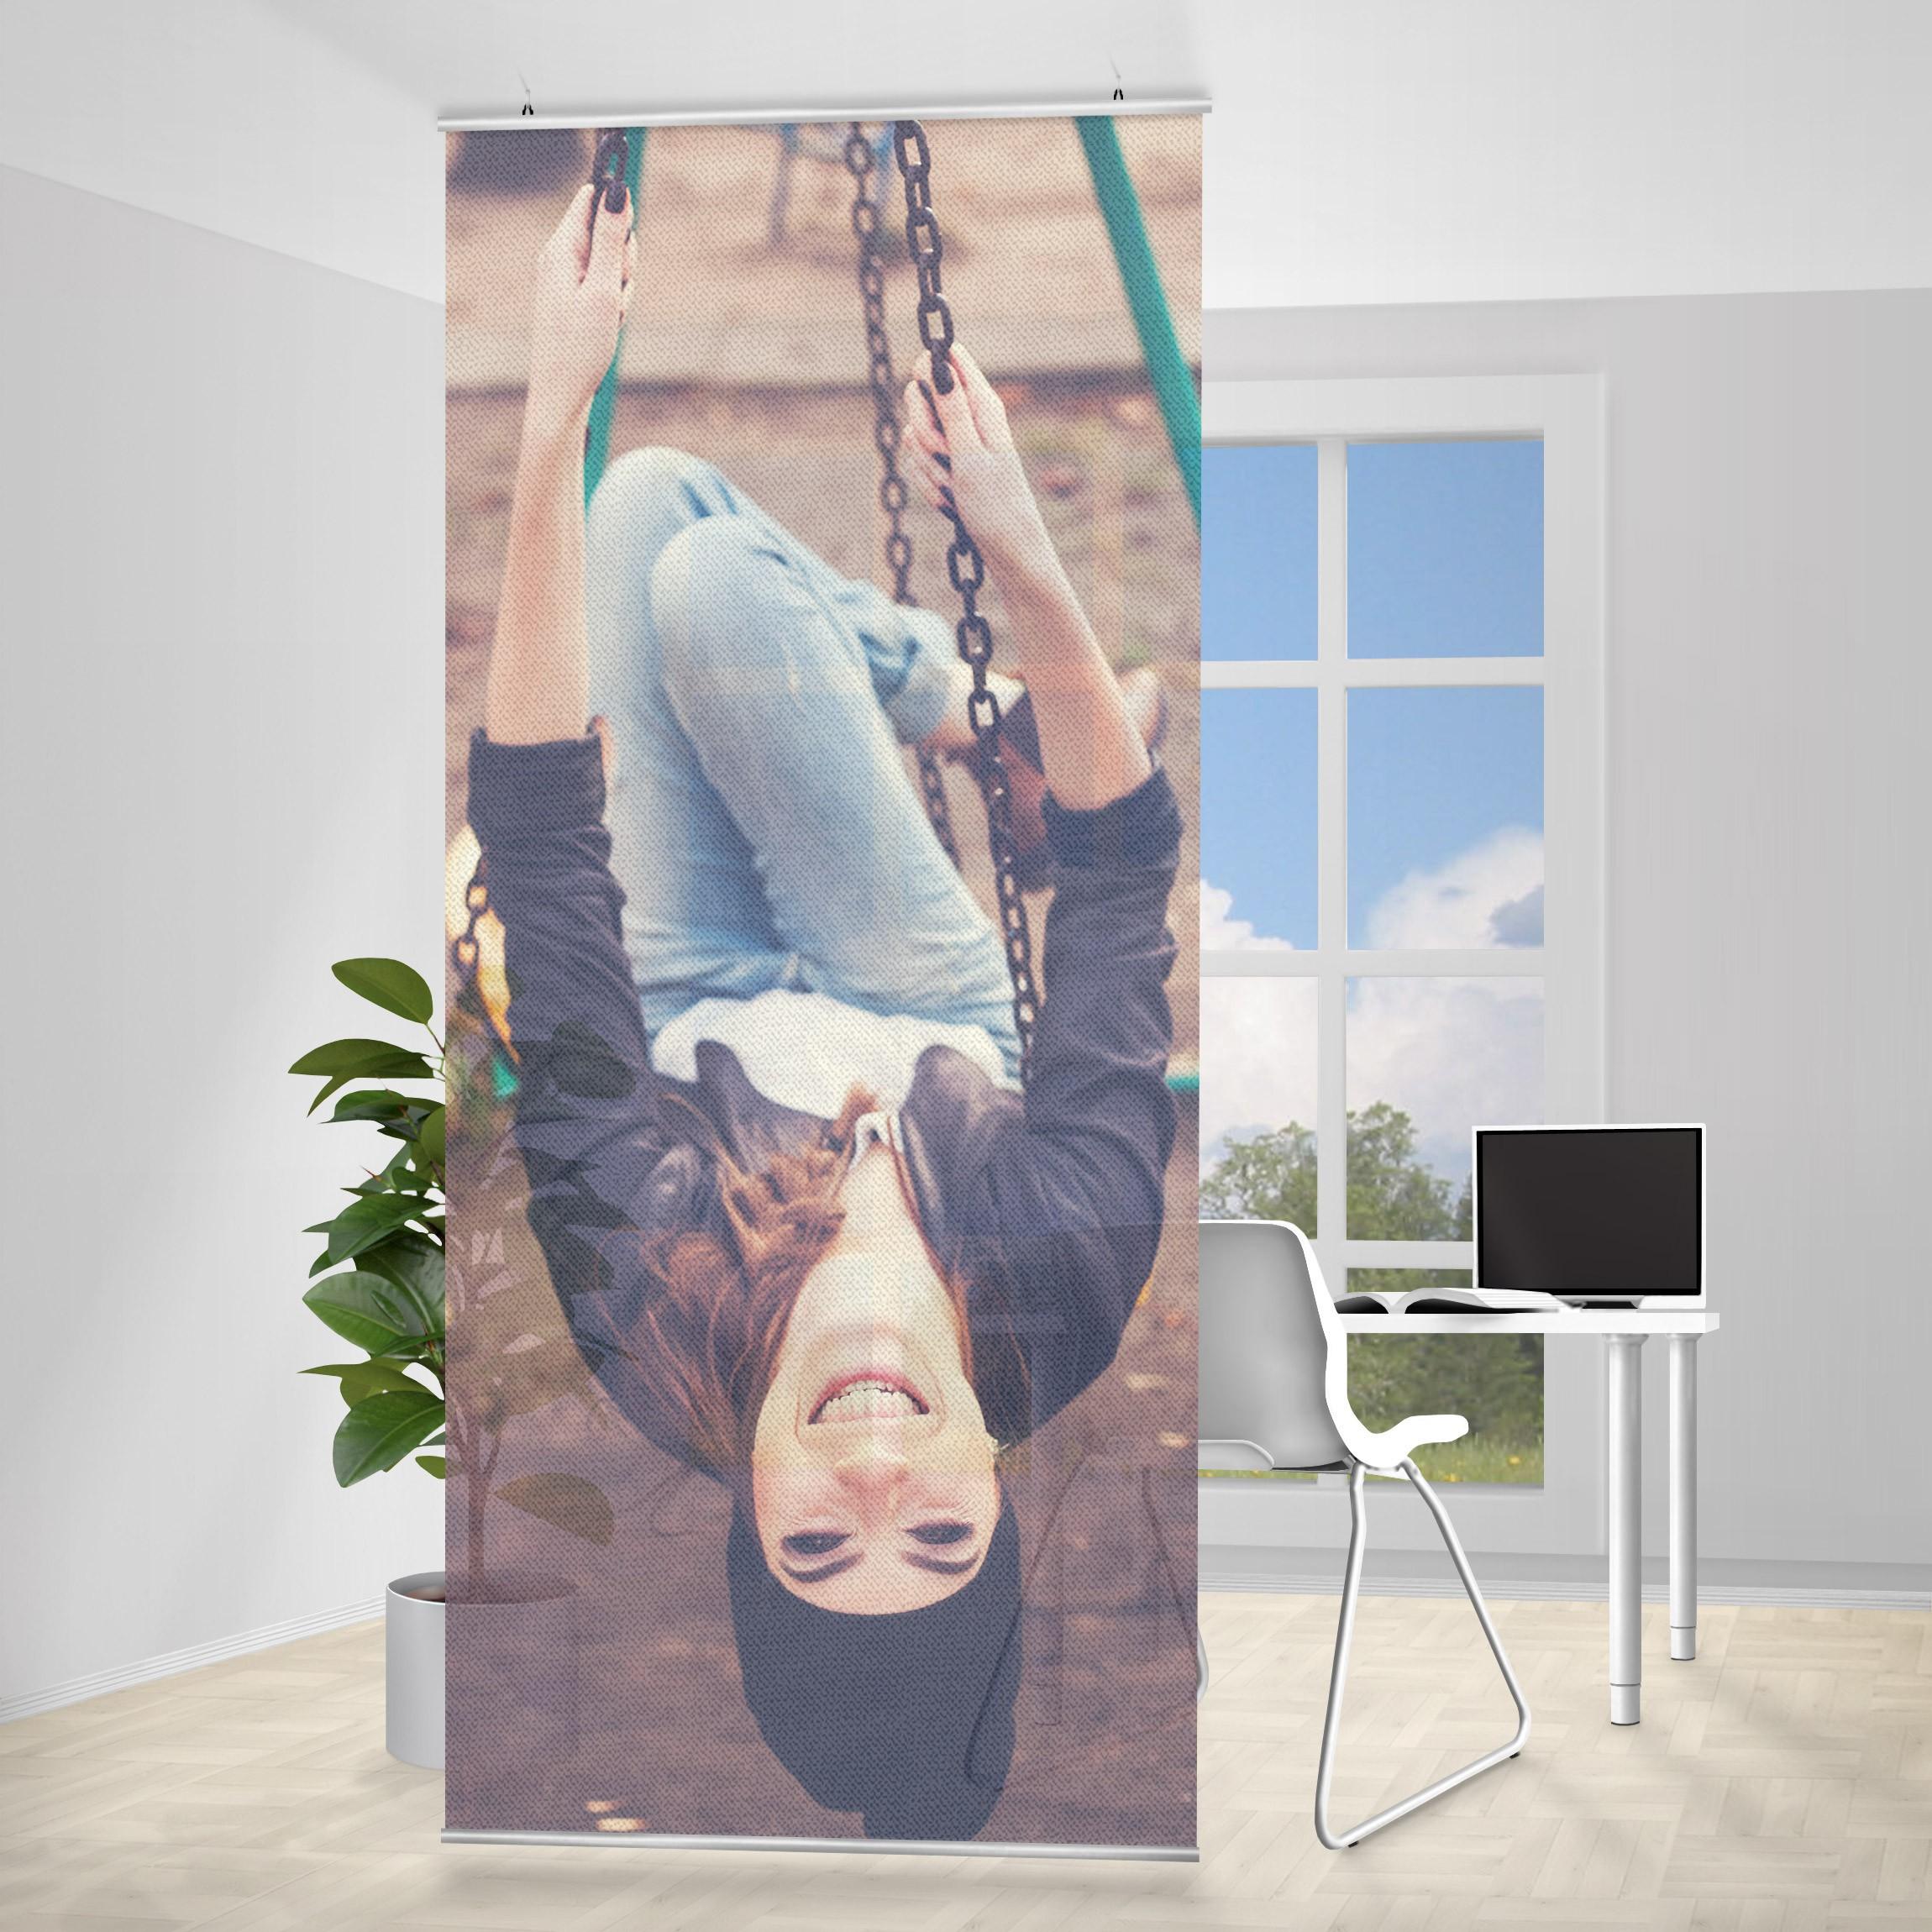 Wunschbild Design Motiv Raumteiler 250x120cm